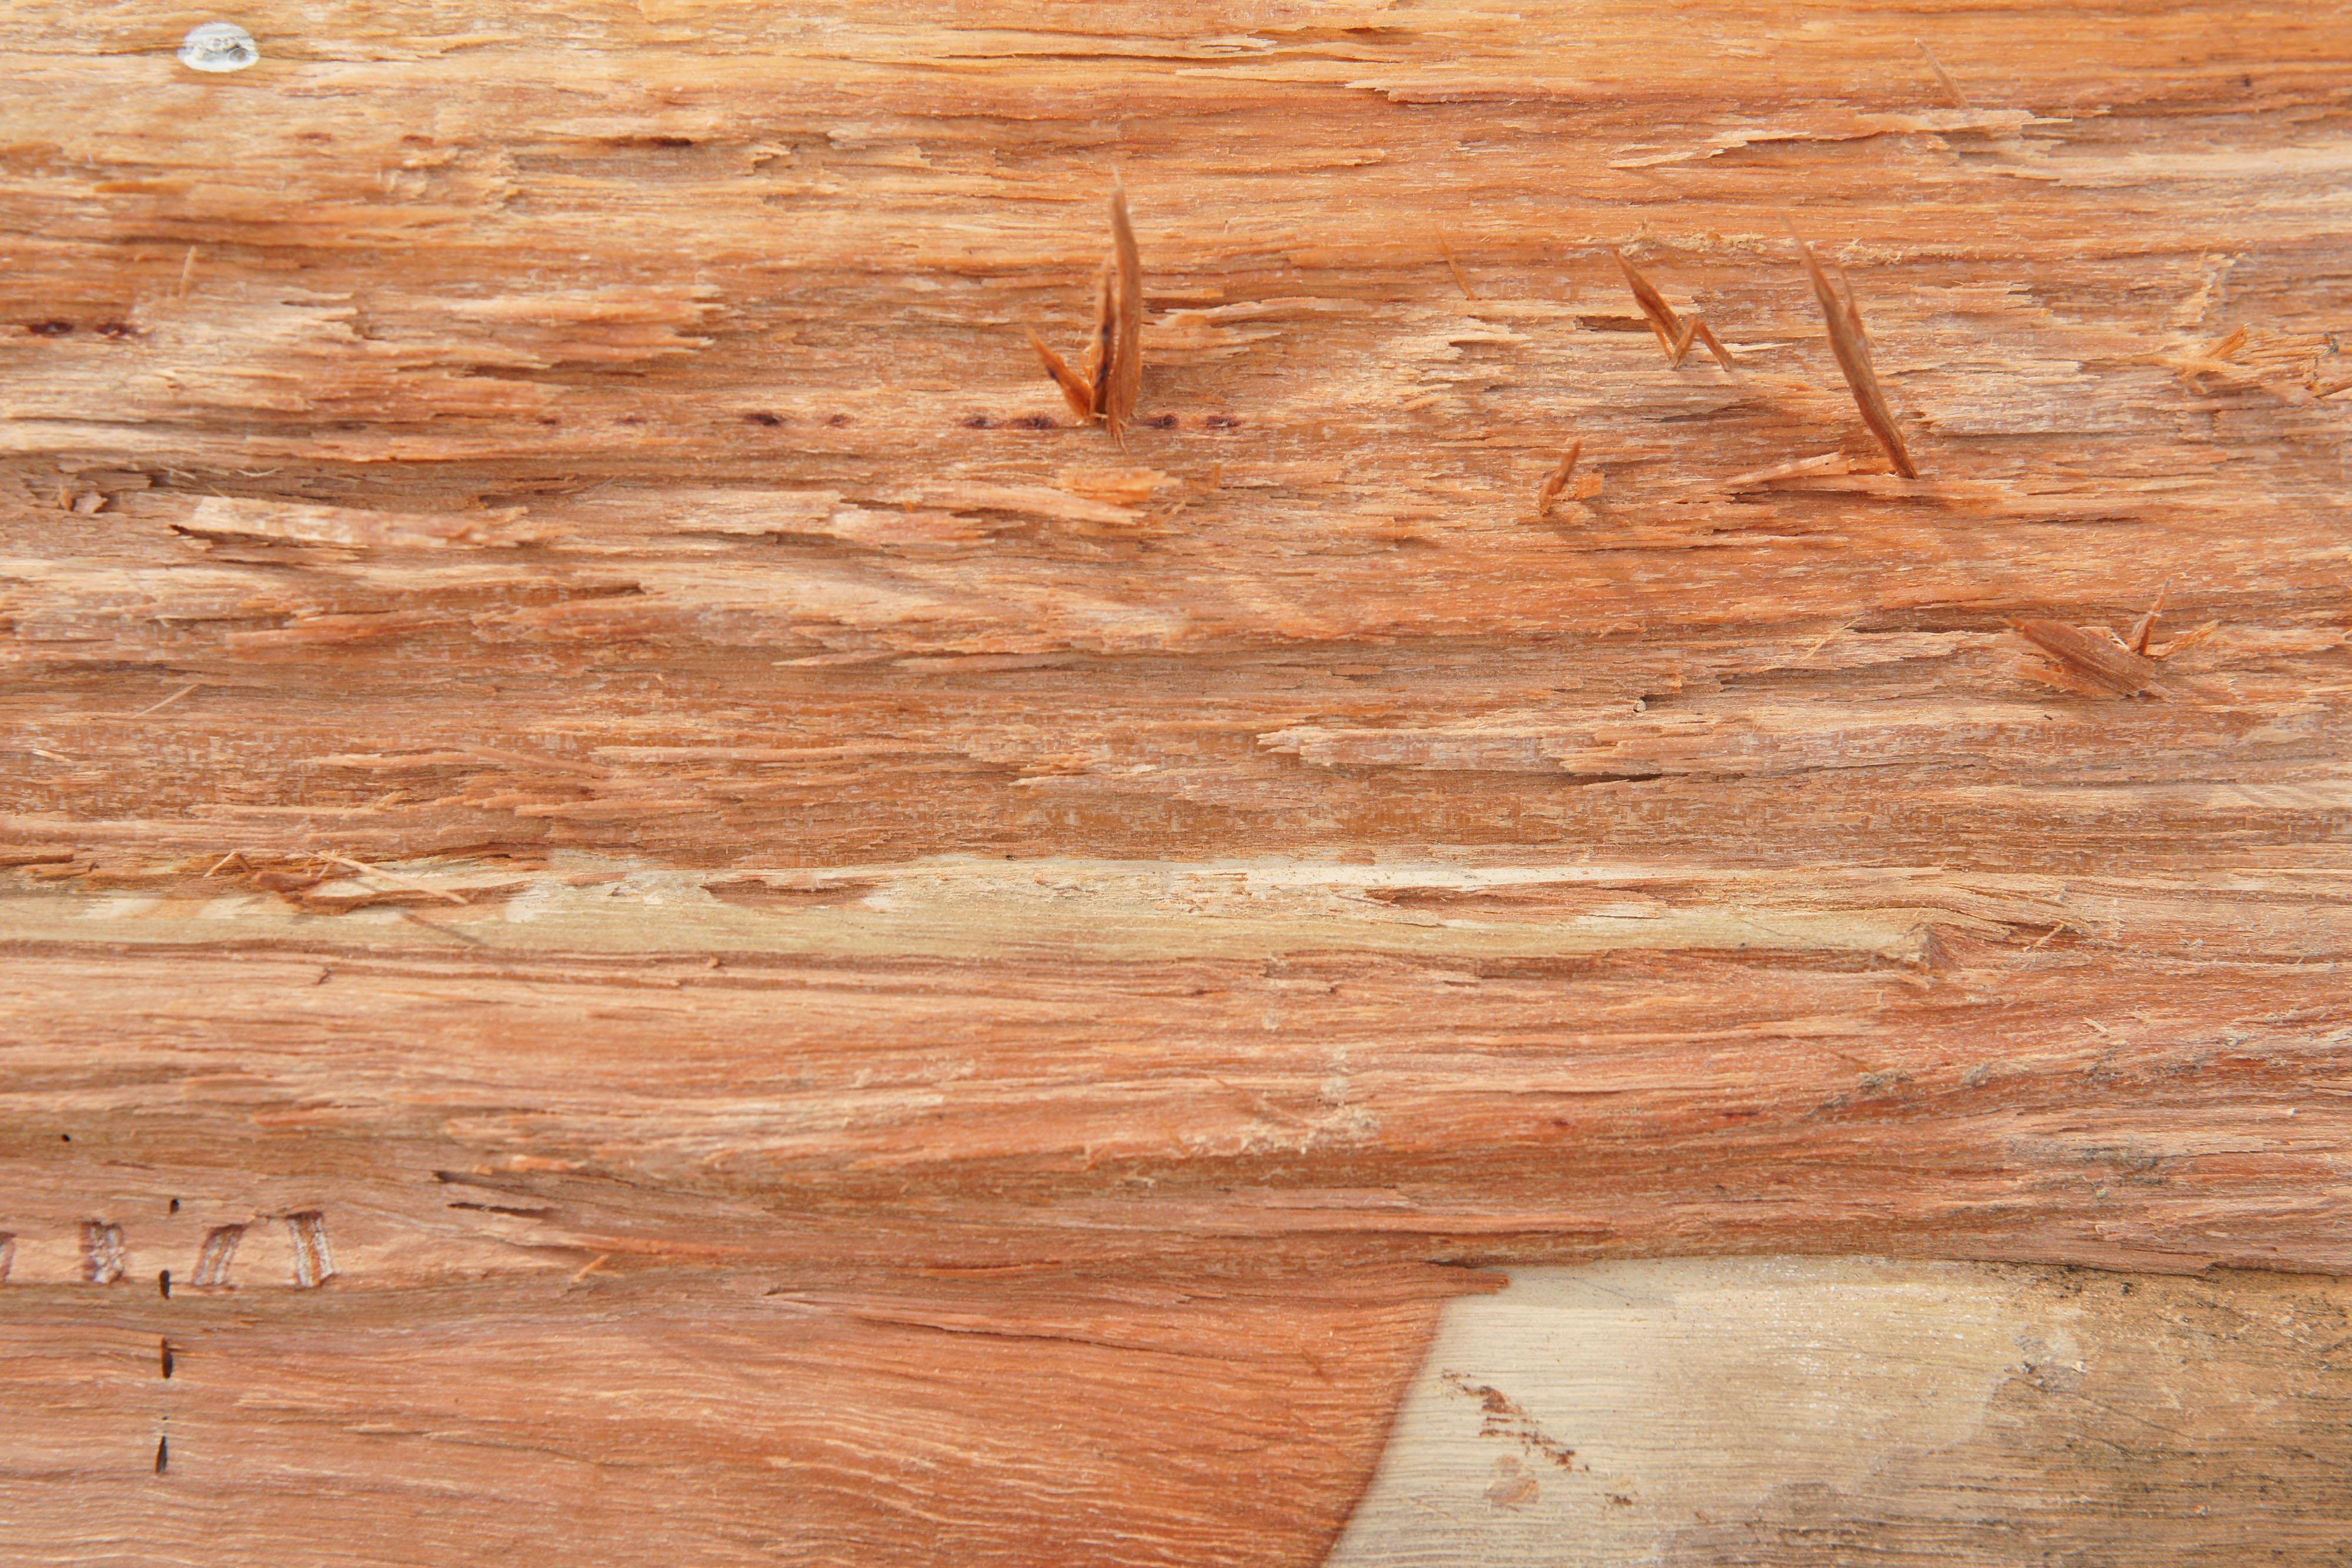 Cut Wood Texture Www Myfreetextures Com Free Textures